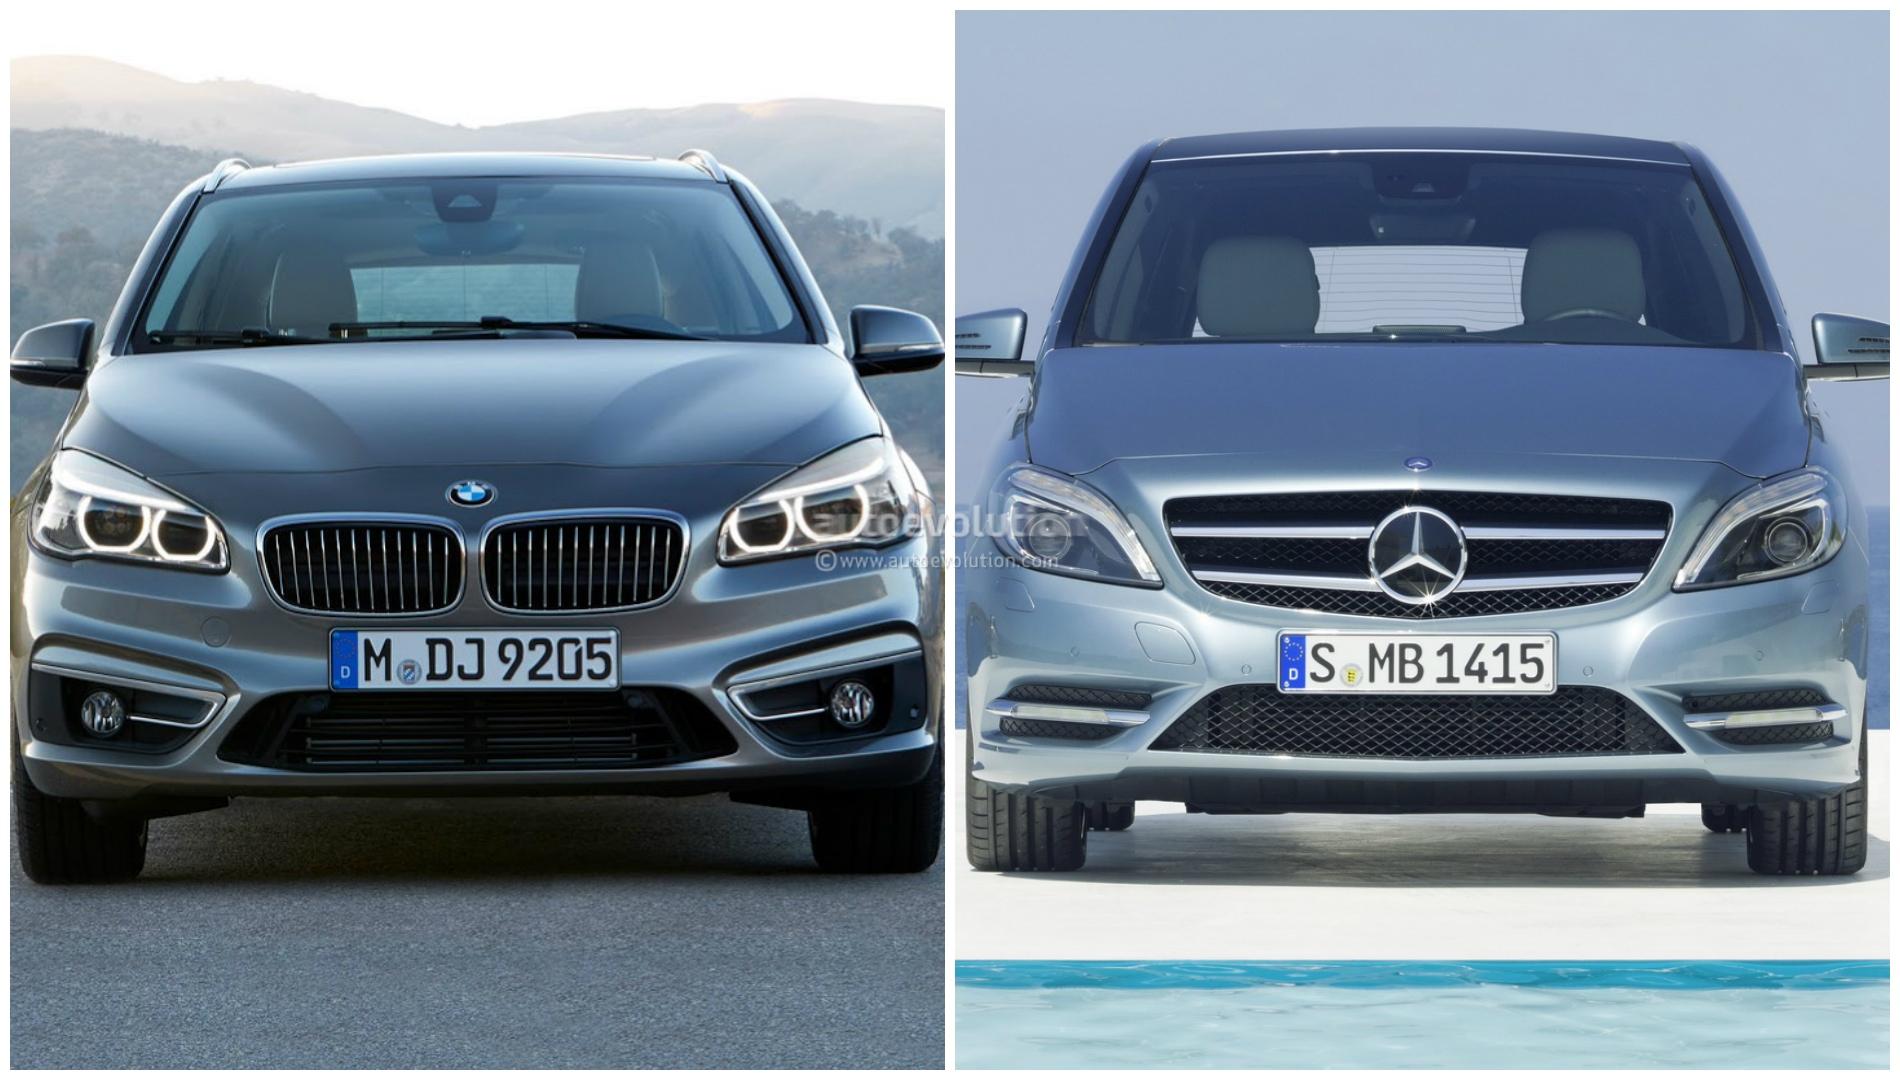 bmw 2 series vs mercedes benz b class photo comparison. Black Bedroom Furniture Sets. Home Design Ideas